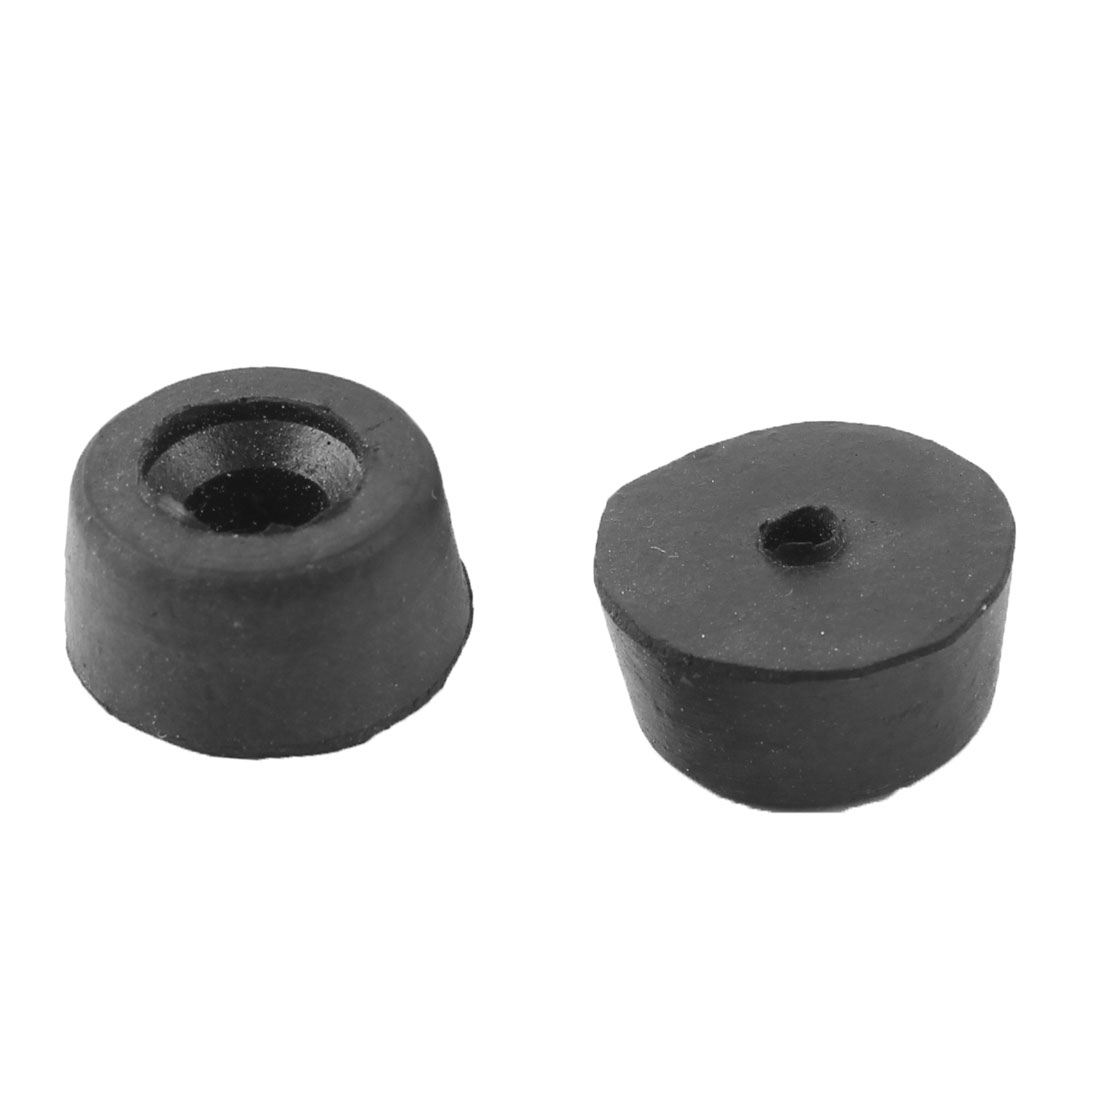 22x18x10mm Black Rubber Table Chair Feet Pads Tile Floor Protectors 2 Pcs